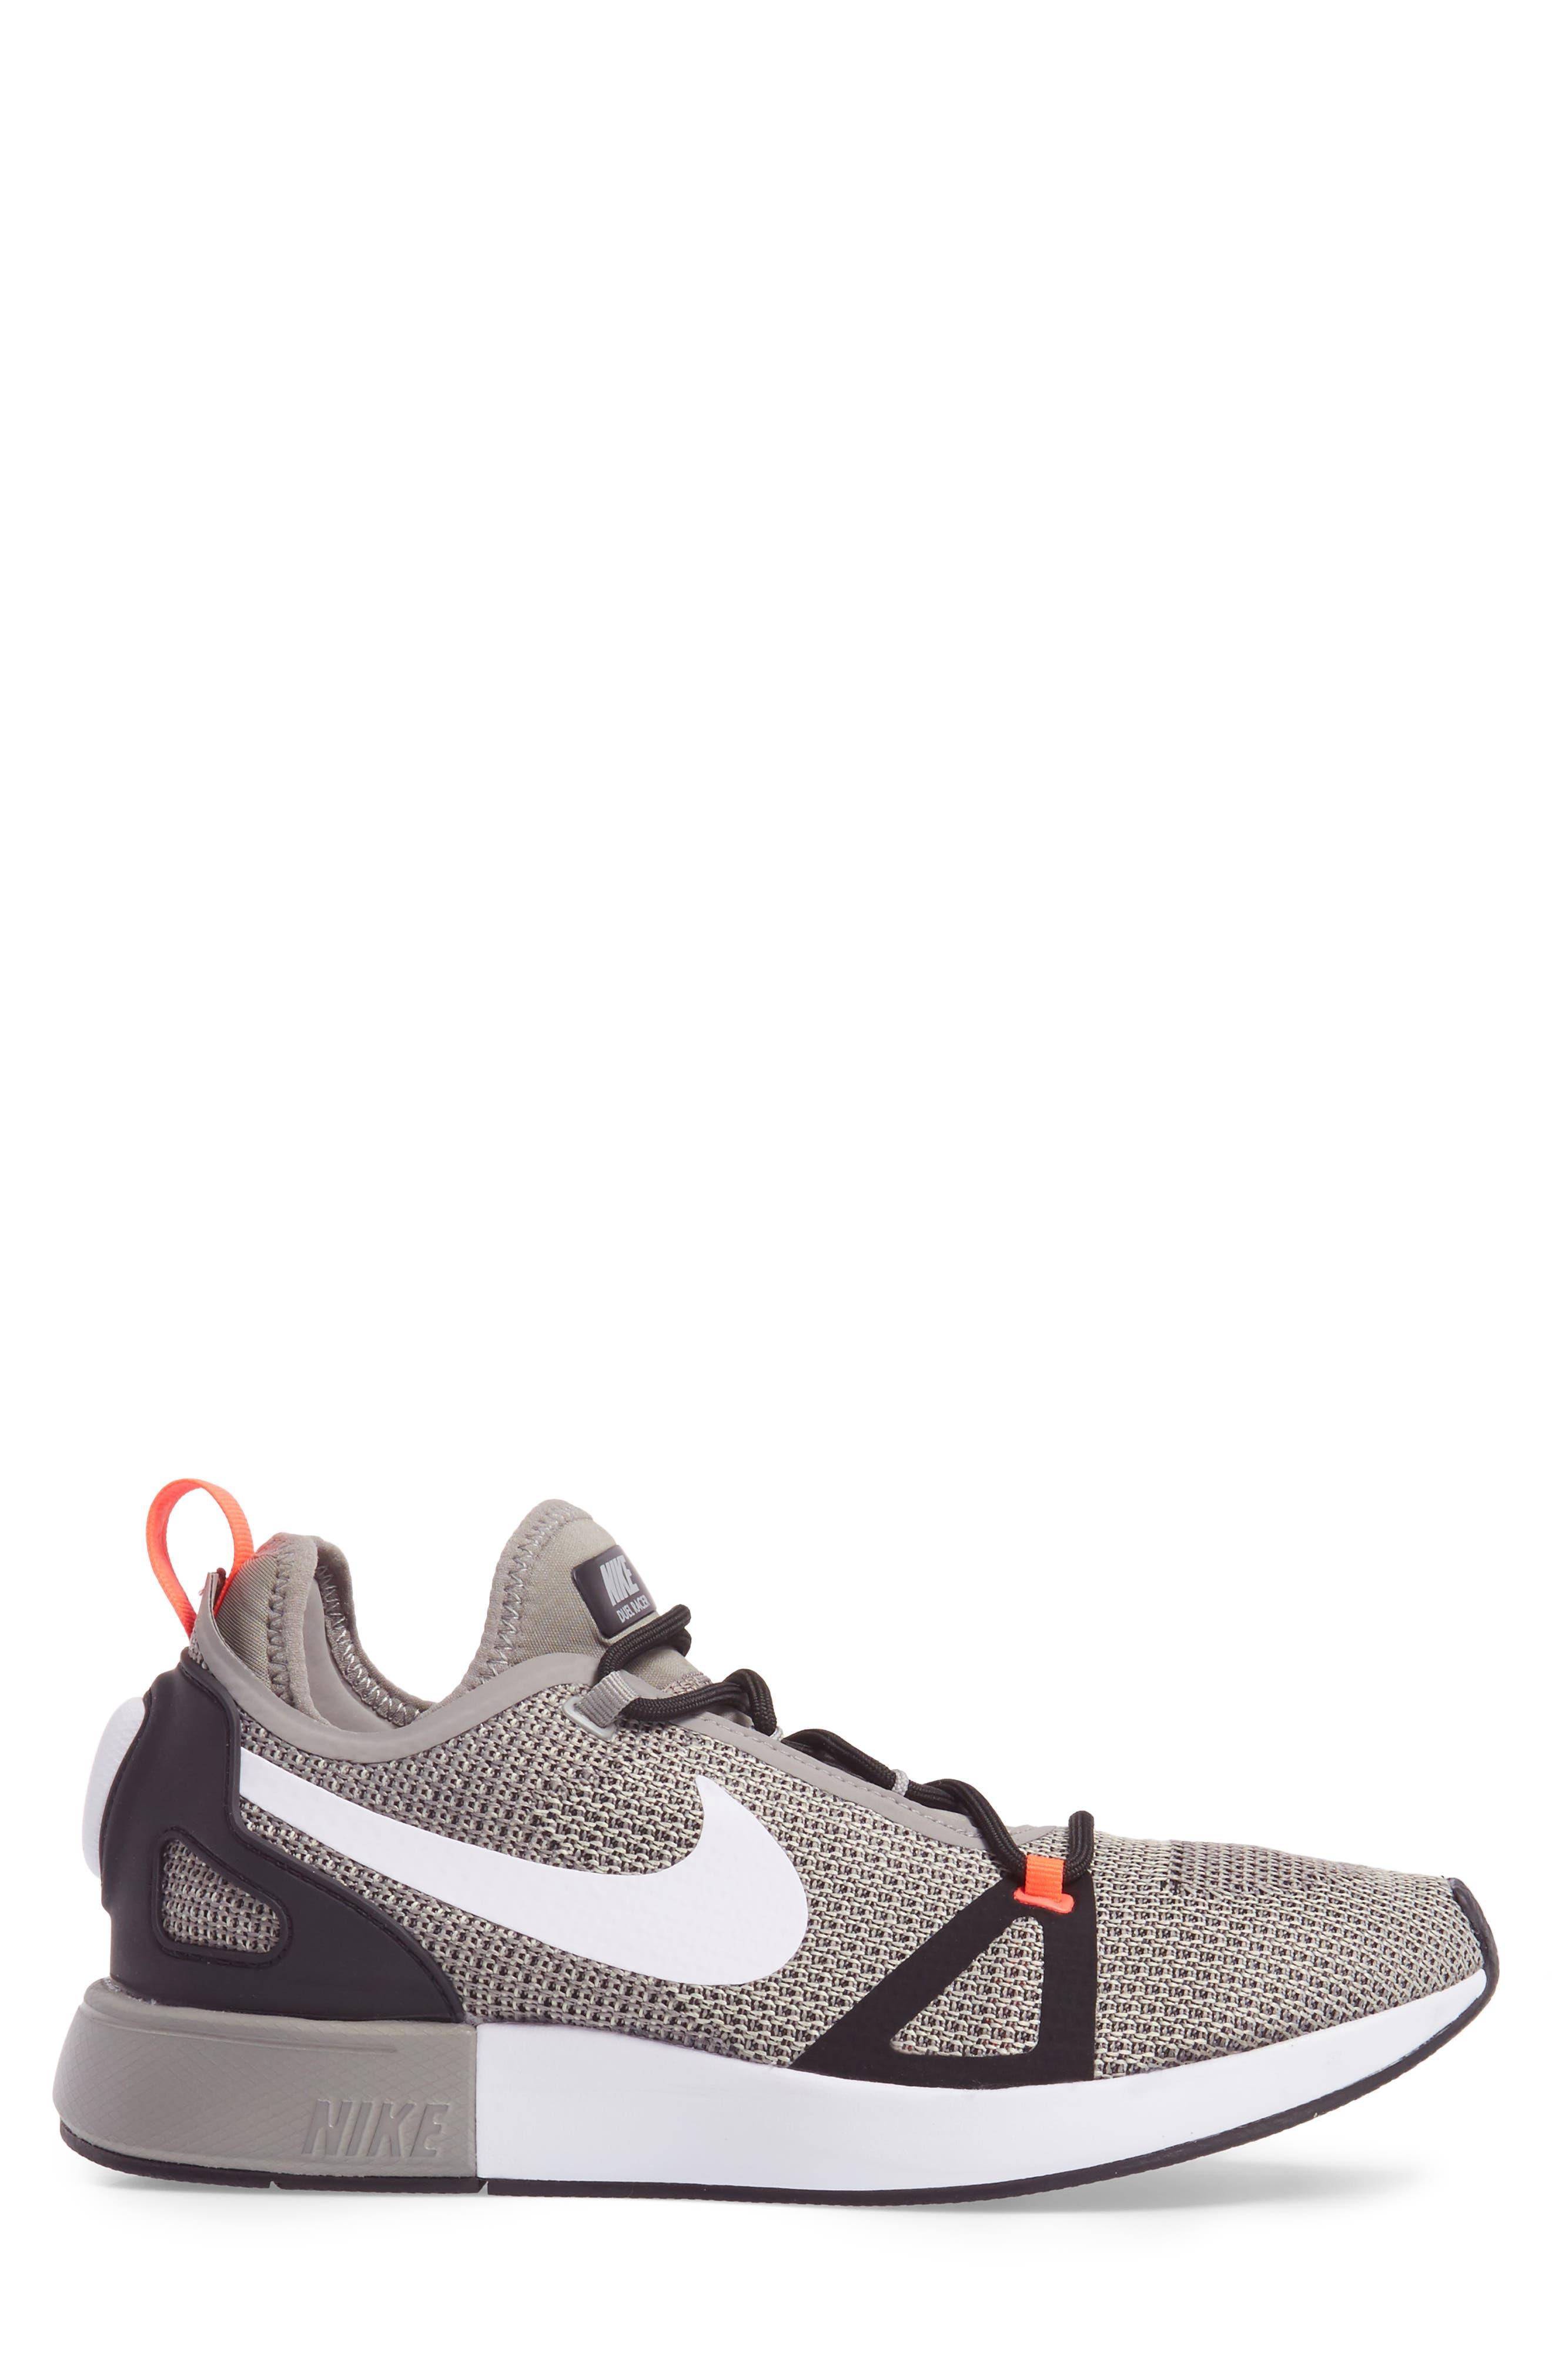 Alternate Image 3  - Nike Duelist Racer Sneaker (Men)